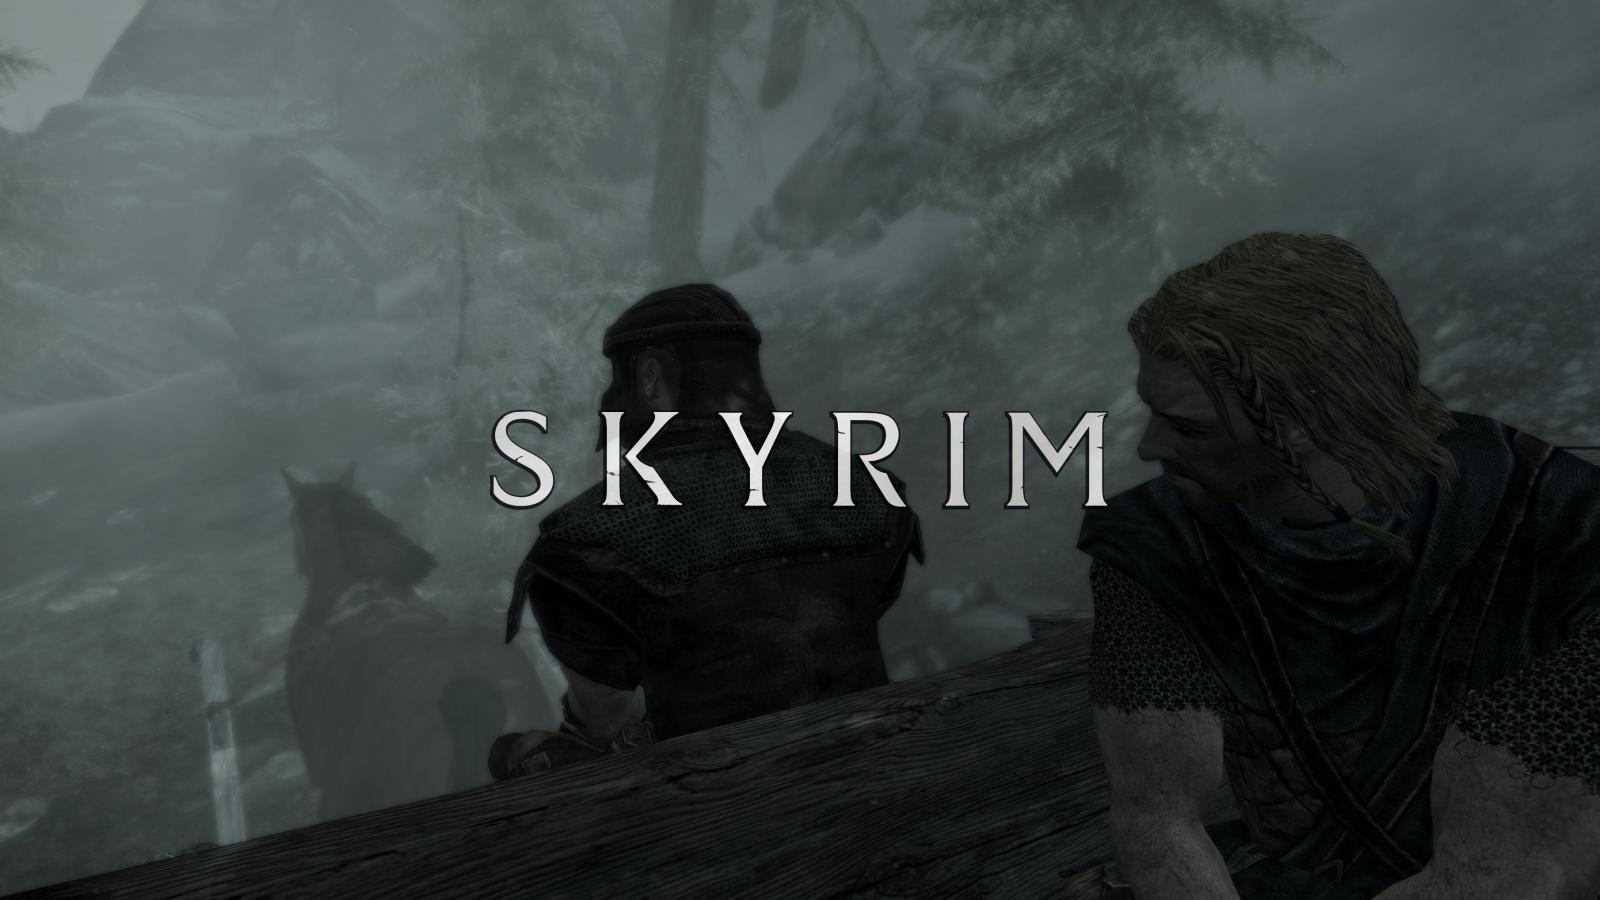 Skyrim Intro Test - Skyrim Gallery - NSFWmods.com